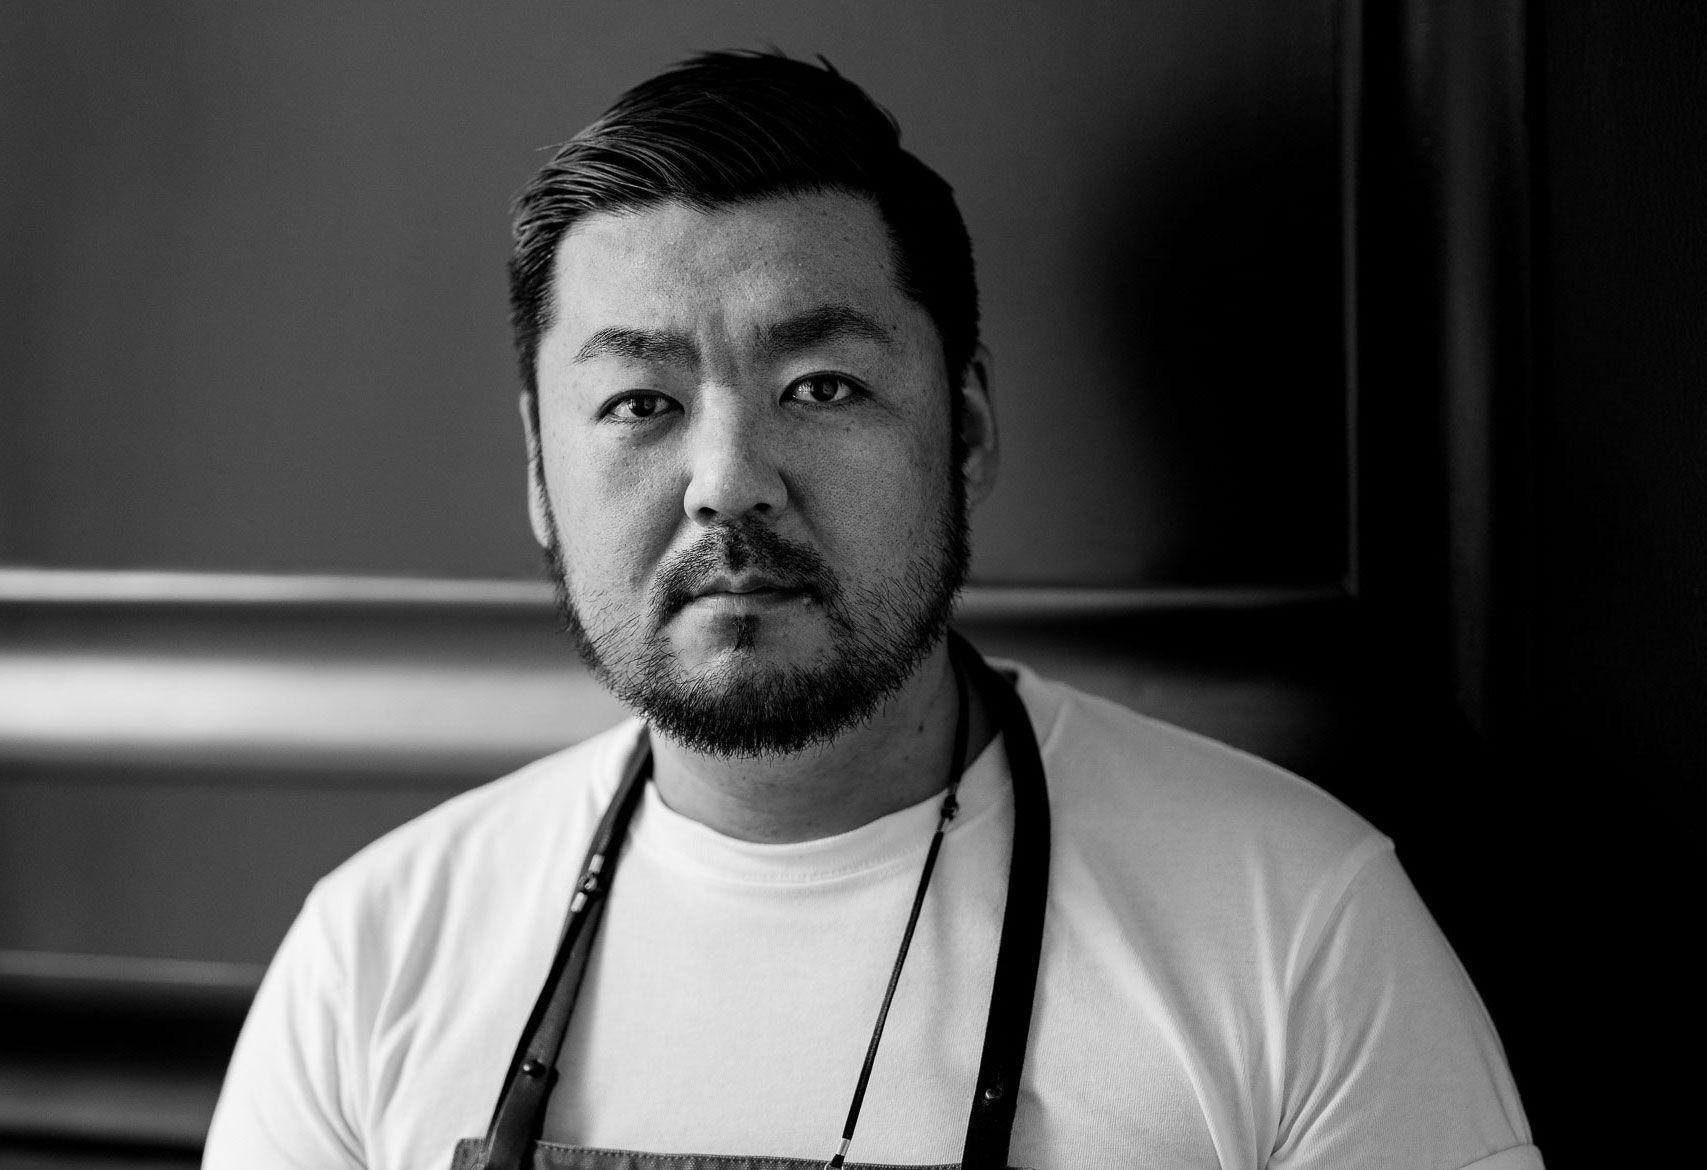 La Cime's Yusuke Takada Receives the Asia's 50 Best Restaurants' Inedit Damm Chefs' Choice Award 2020